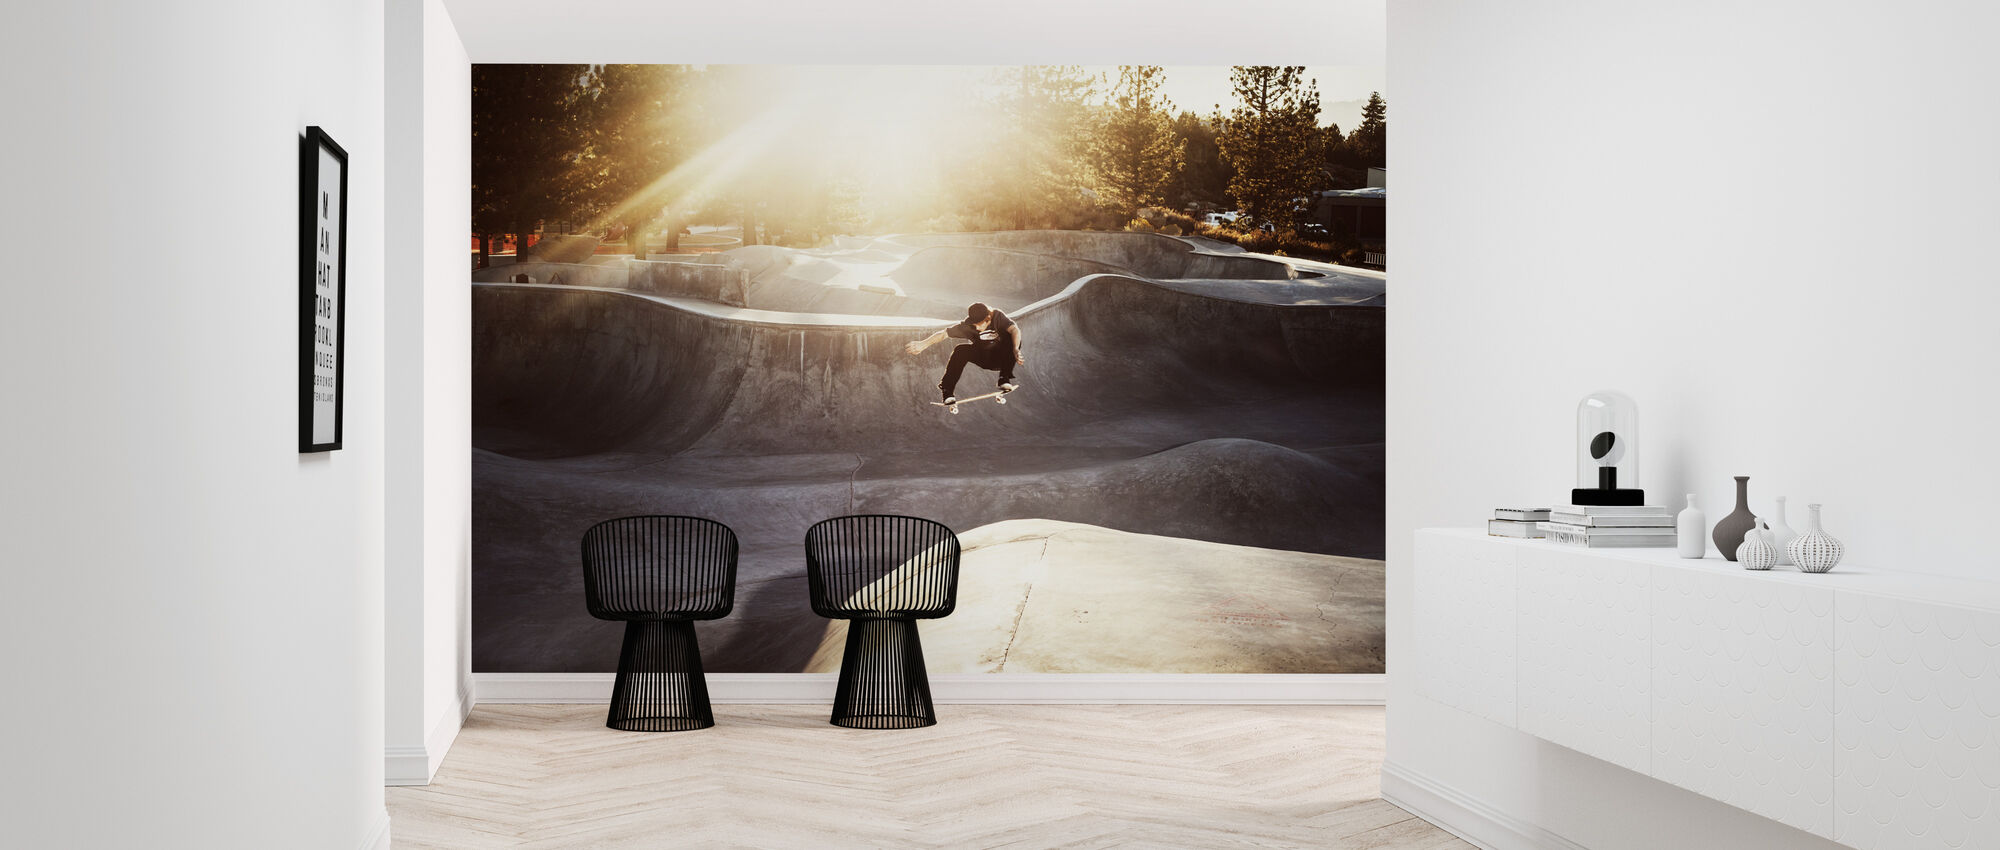 Skateboard Park - Behang - Gang